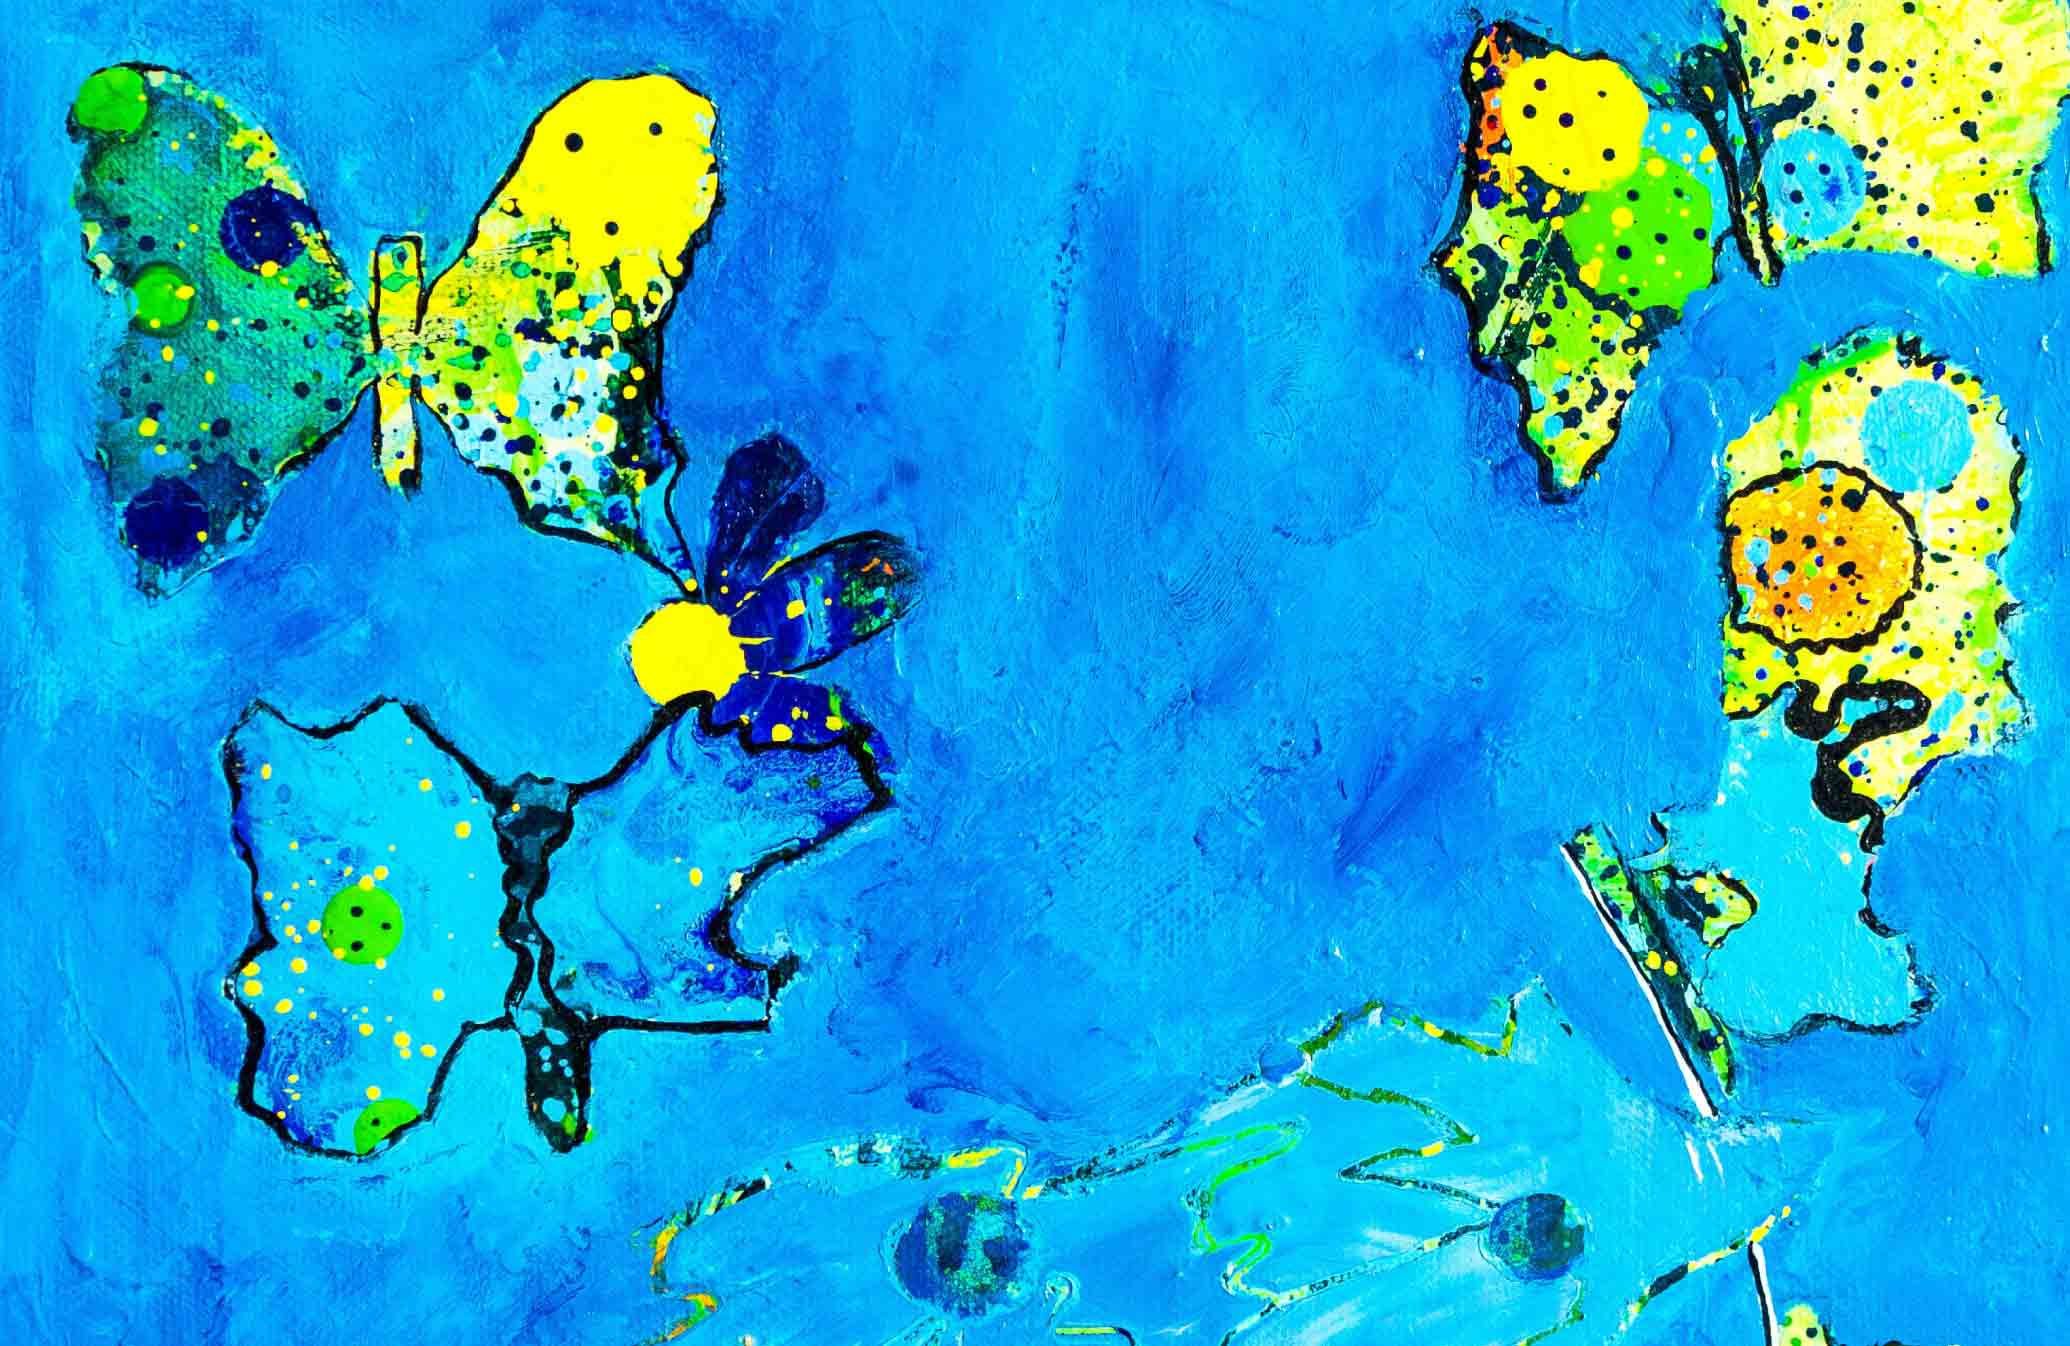 COVID-19 Butterfly Effect